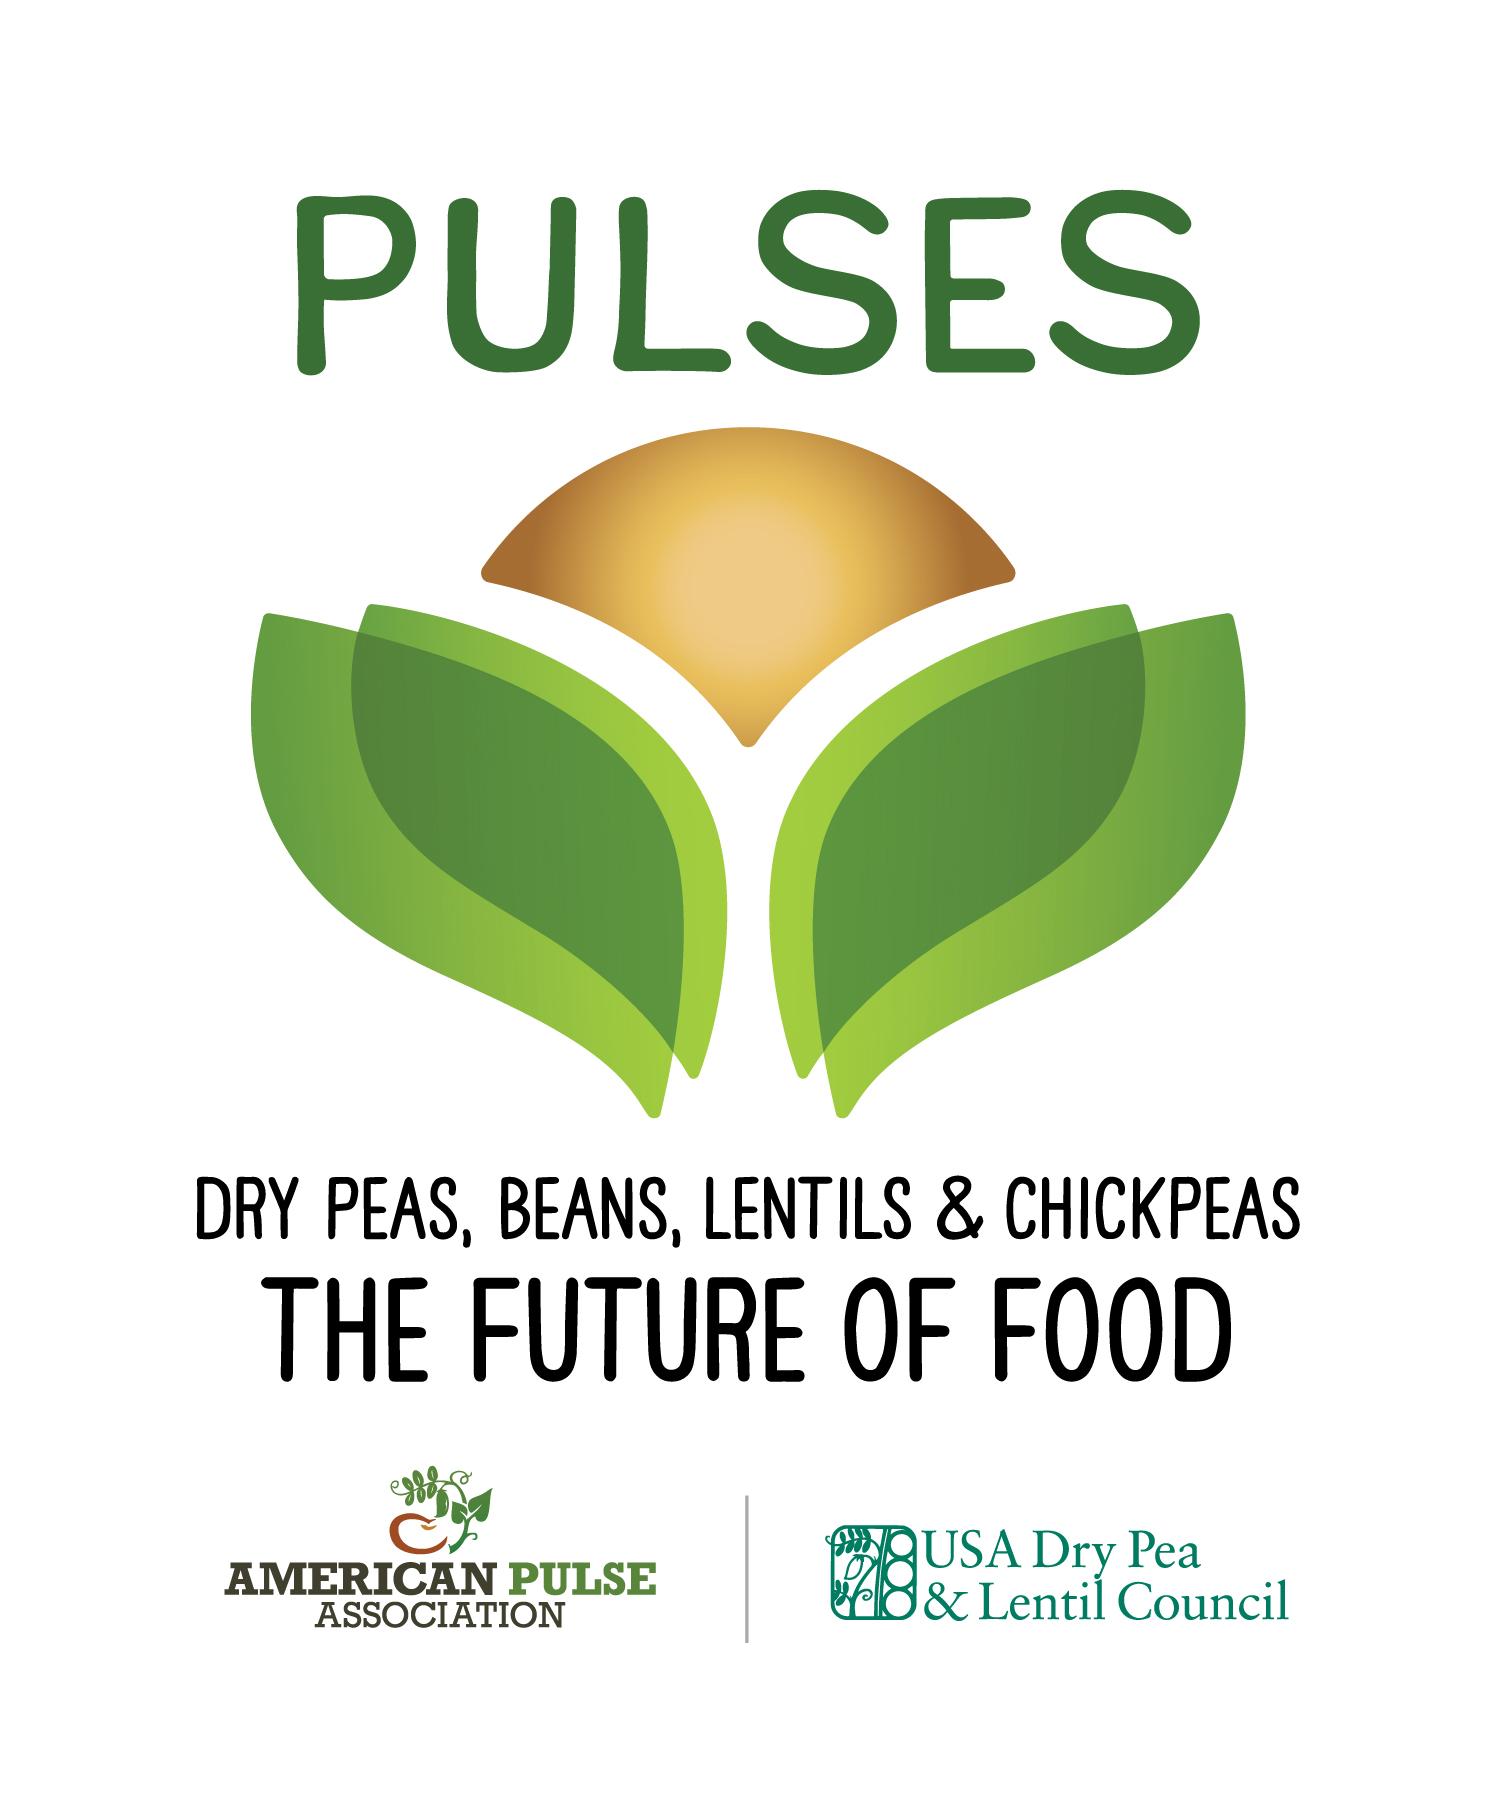 Pulses_Future_of_Food_LogoGROUP_0908a_FNL